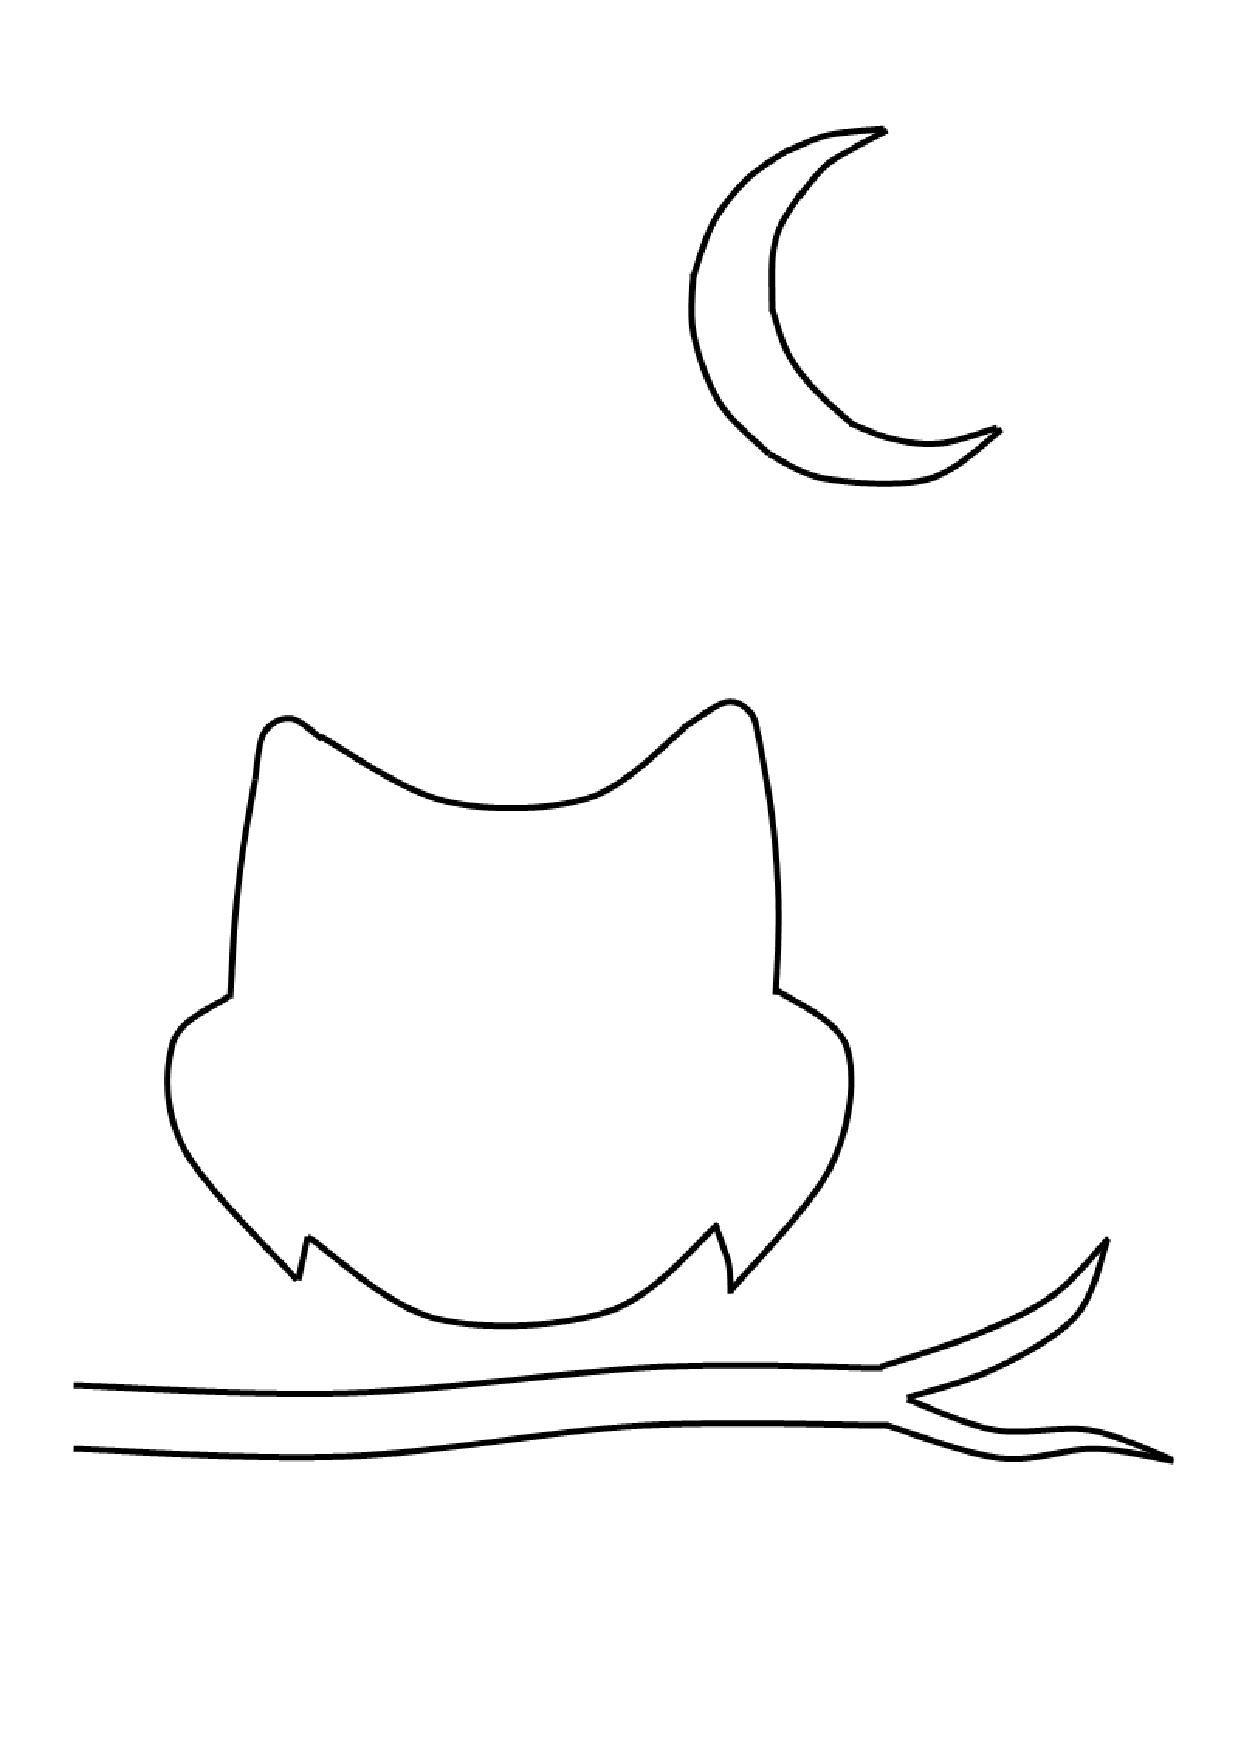 Gabarit - Hibou À Pois Blancs encequiconcerne Hibou A Imprimer